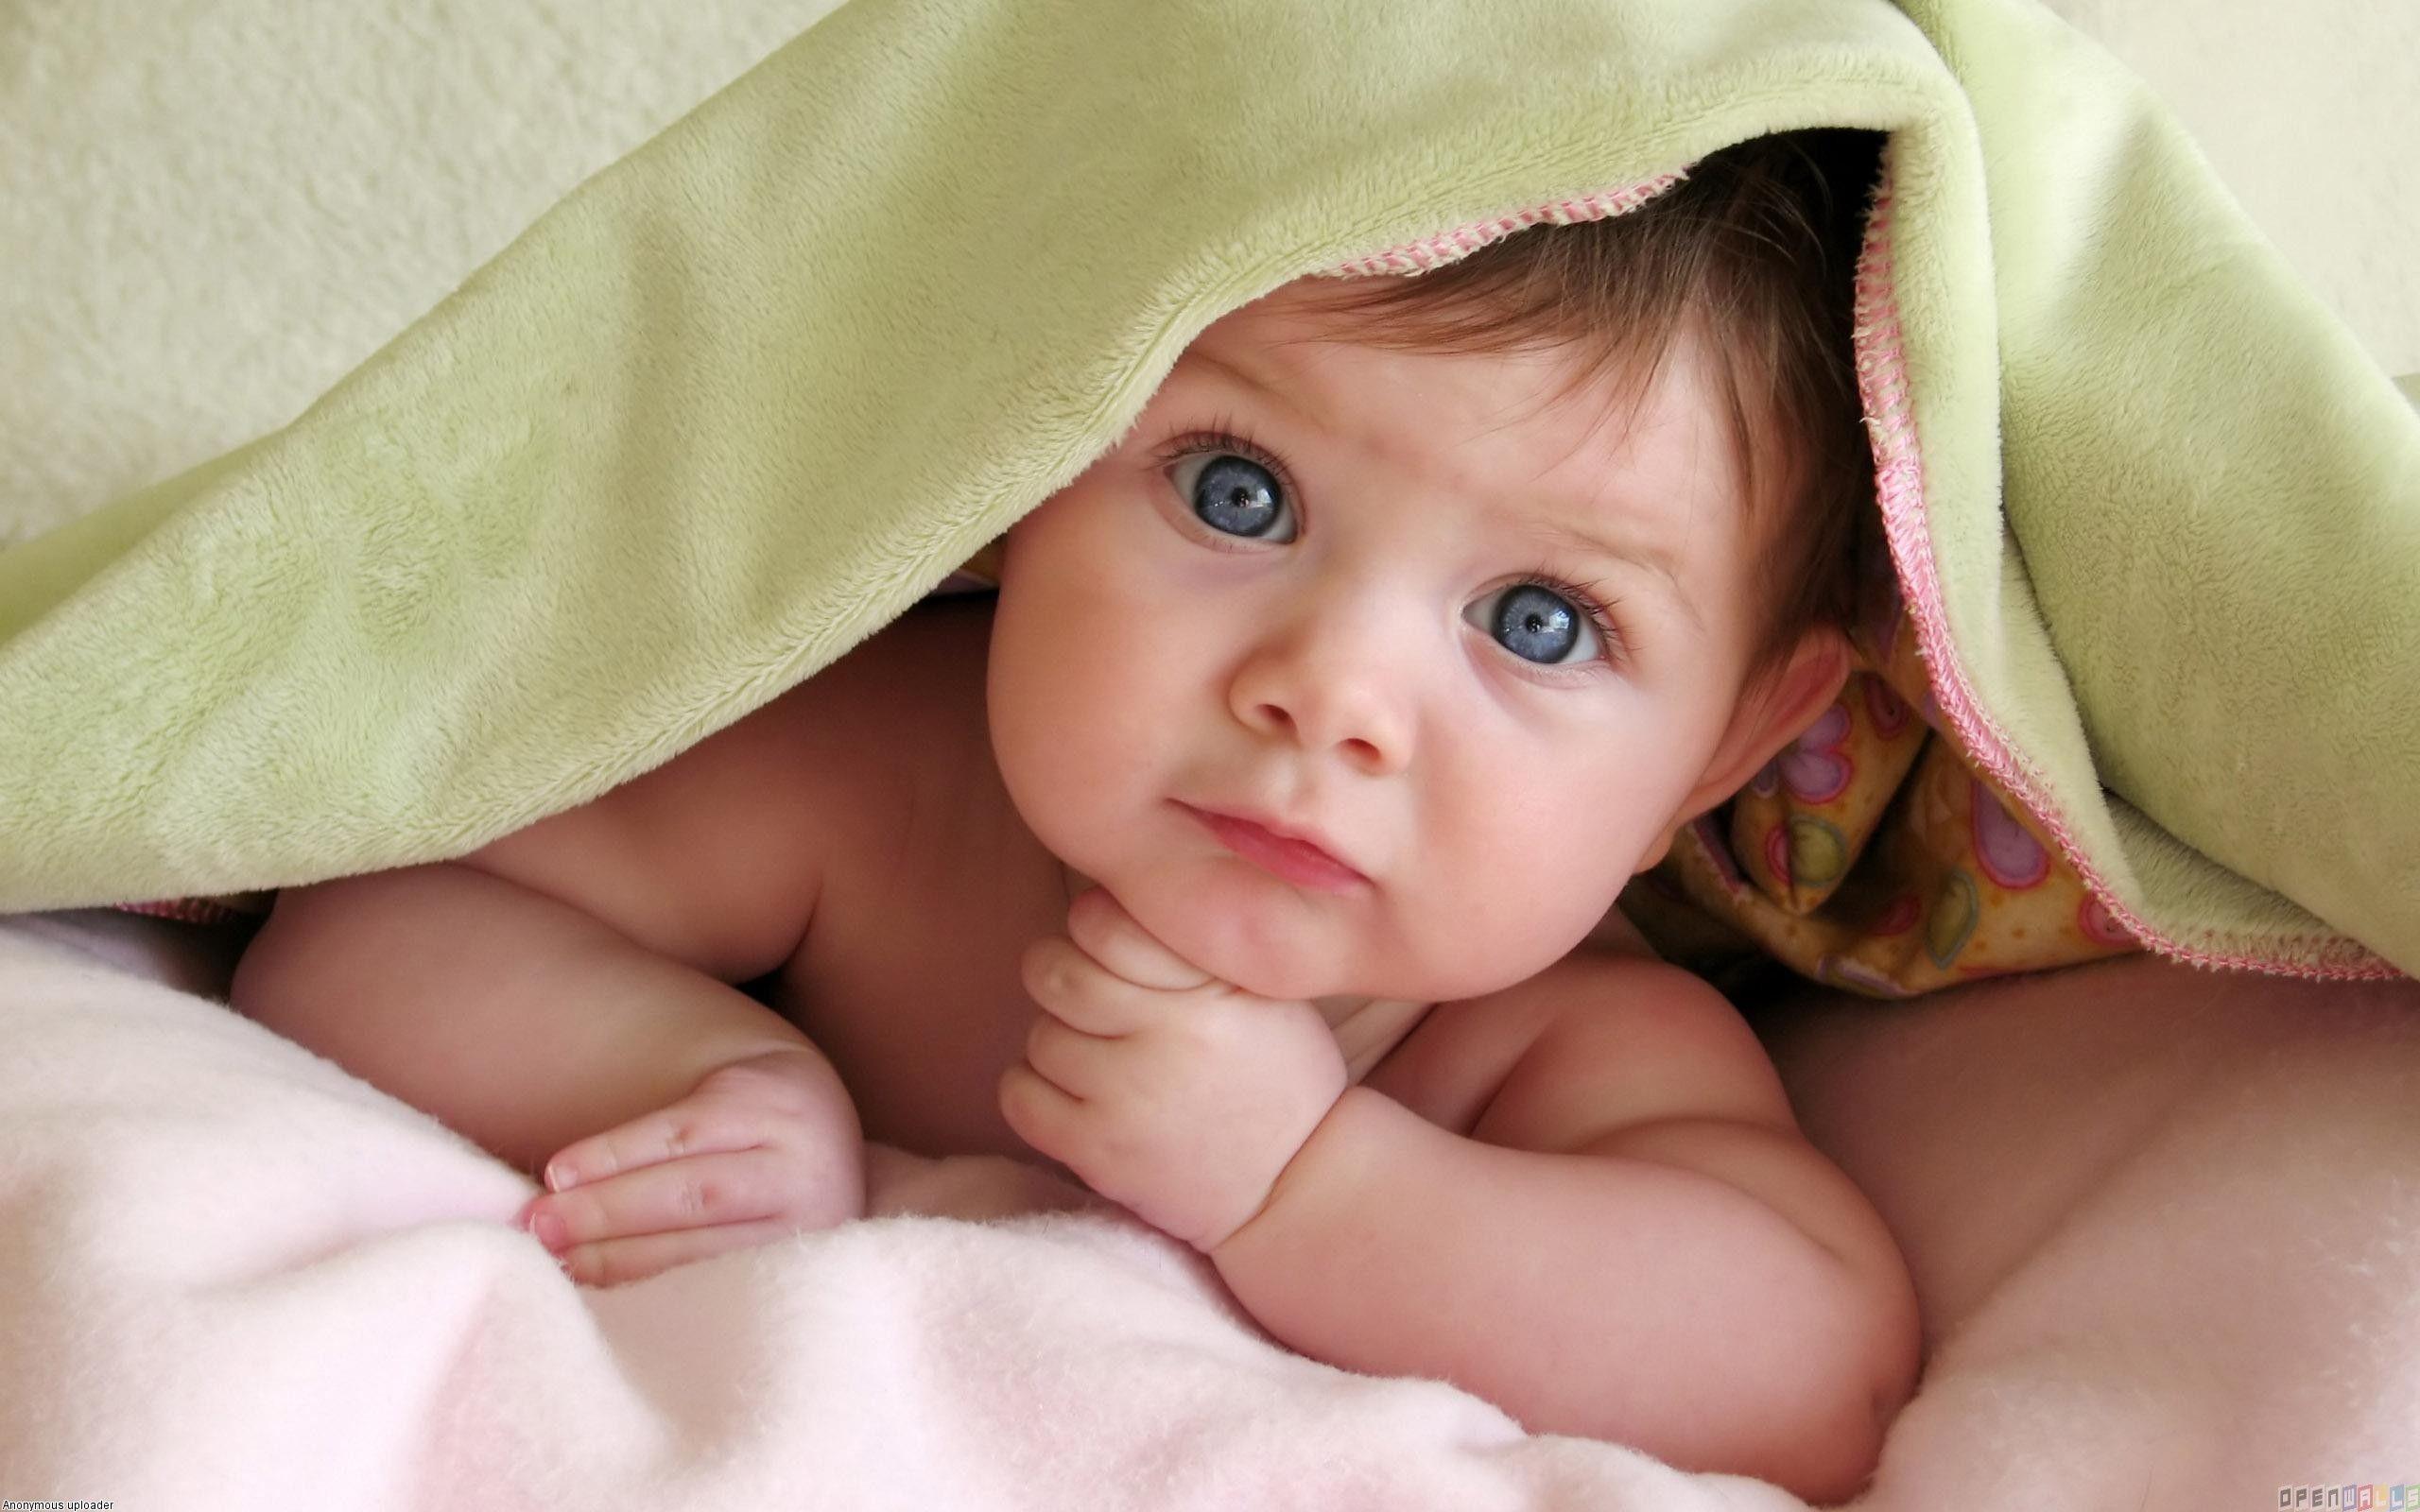 Cute Baby Wallpaper For Desktop 4 2560x